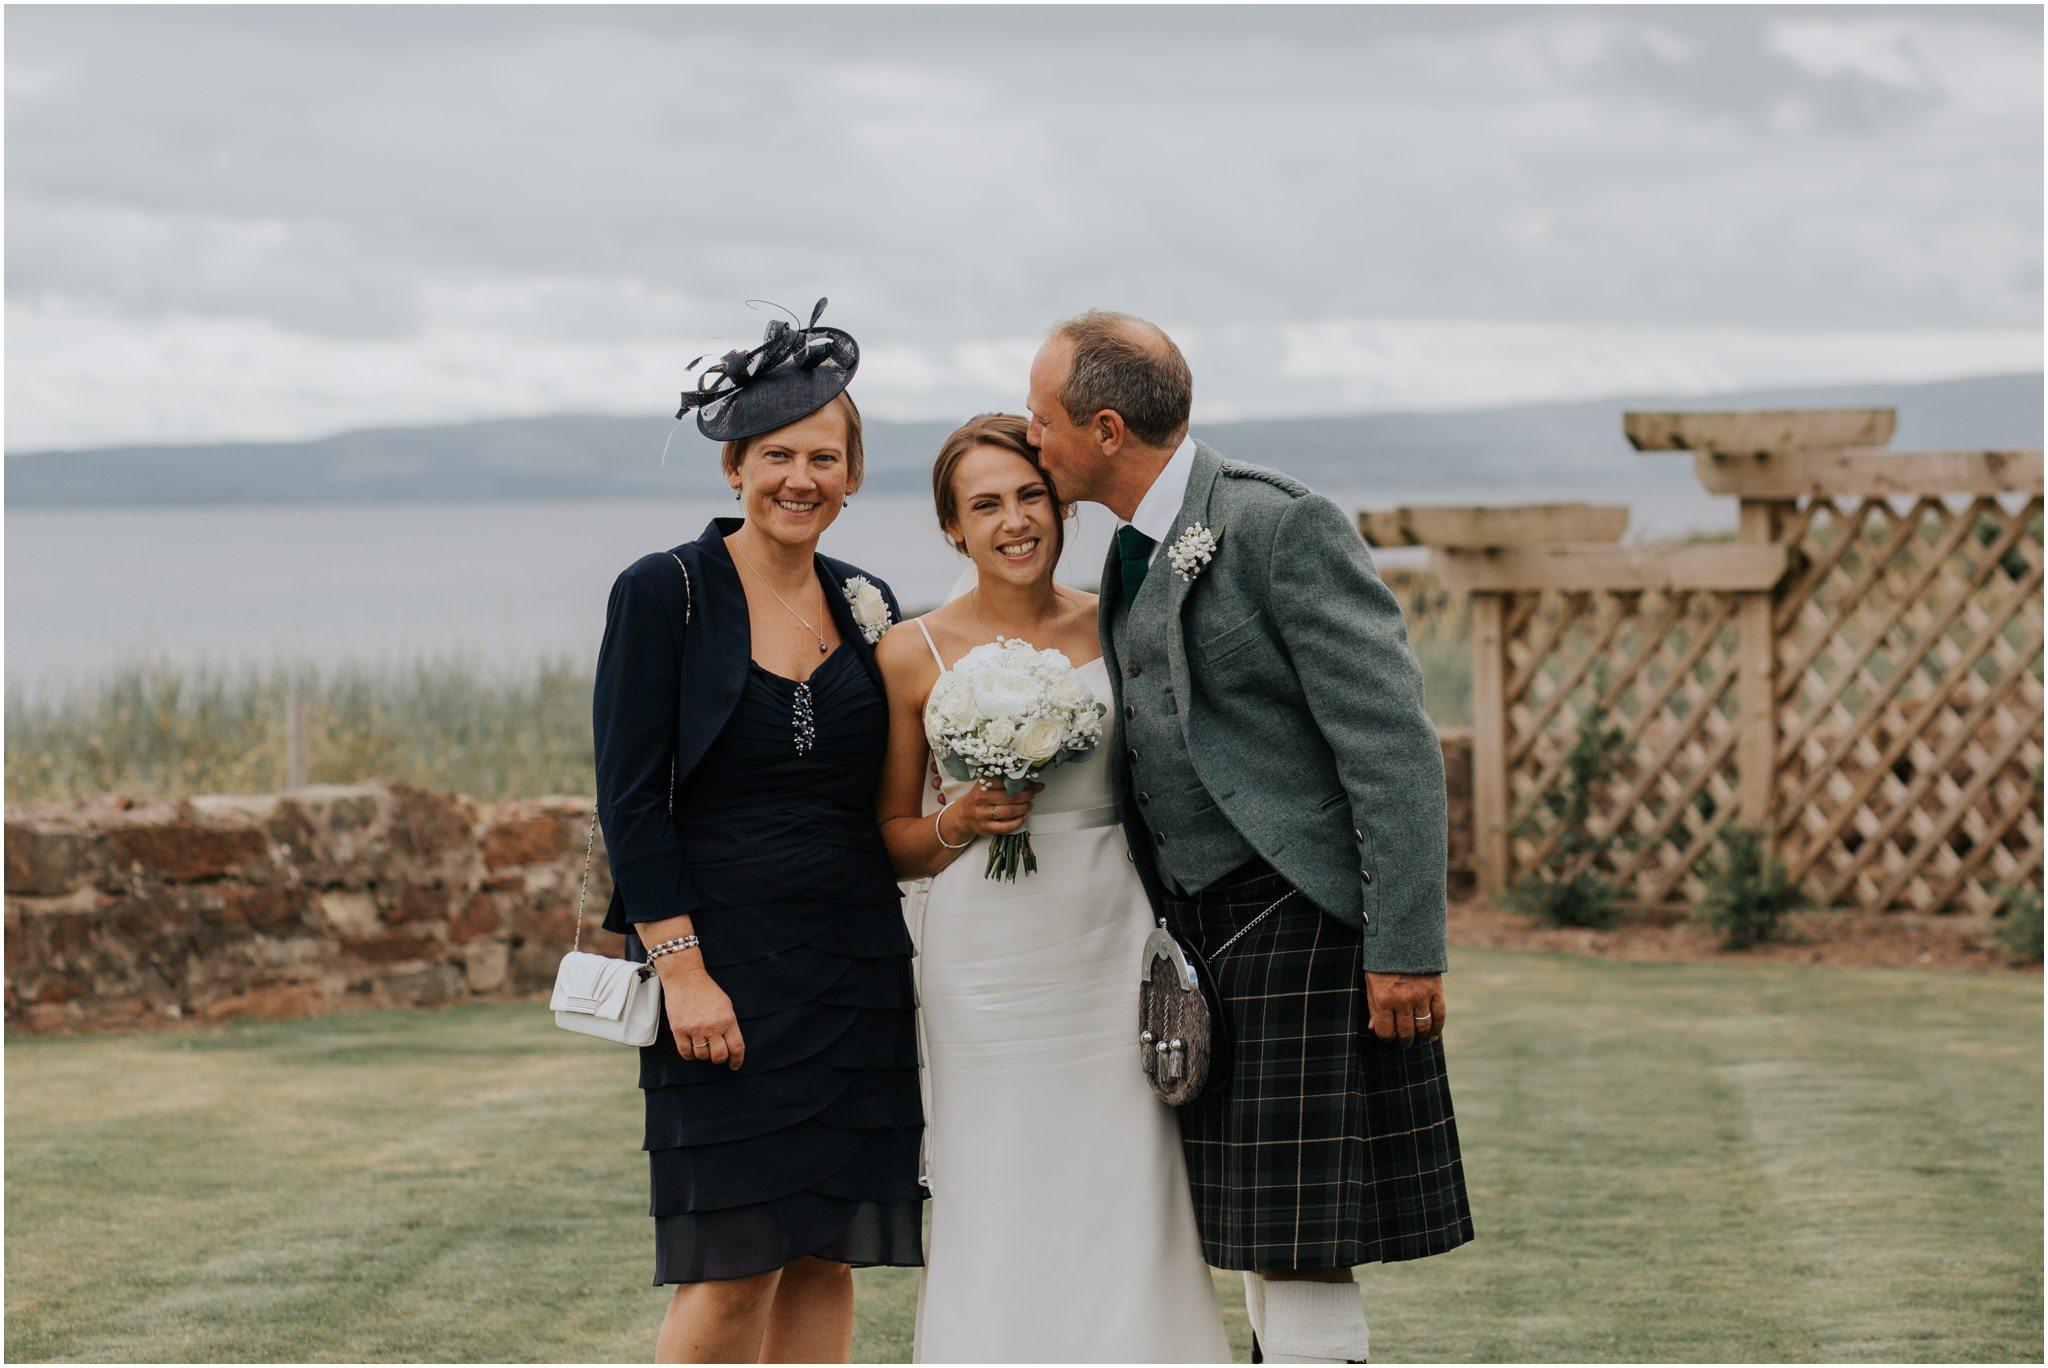 Photography 78 - Glasgow Wedding Photographer - Jordan & Abi - The Waterside Hotel, West Kilbride_0096.jpg